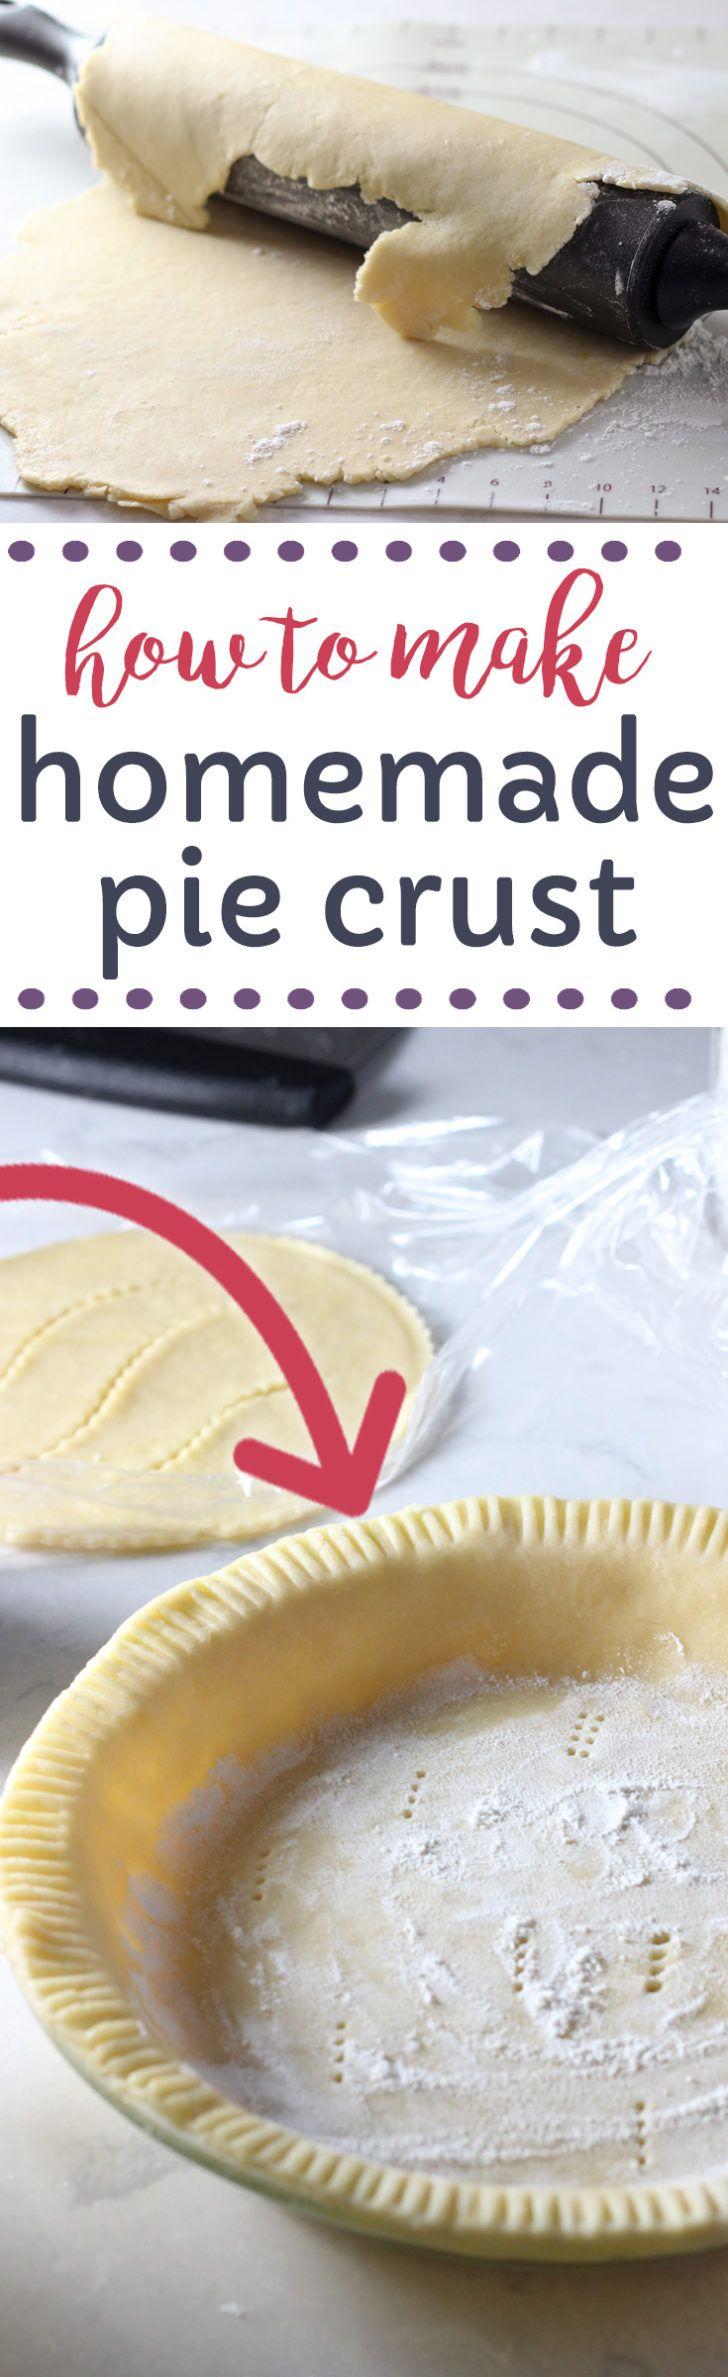 The Best Homemade Pie Crust Recipe